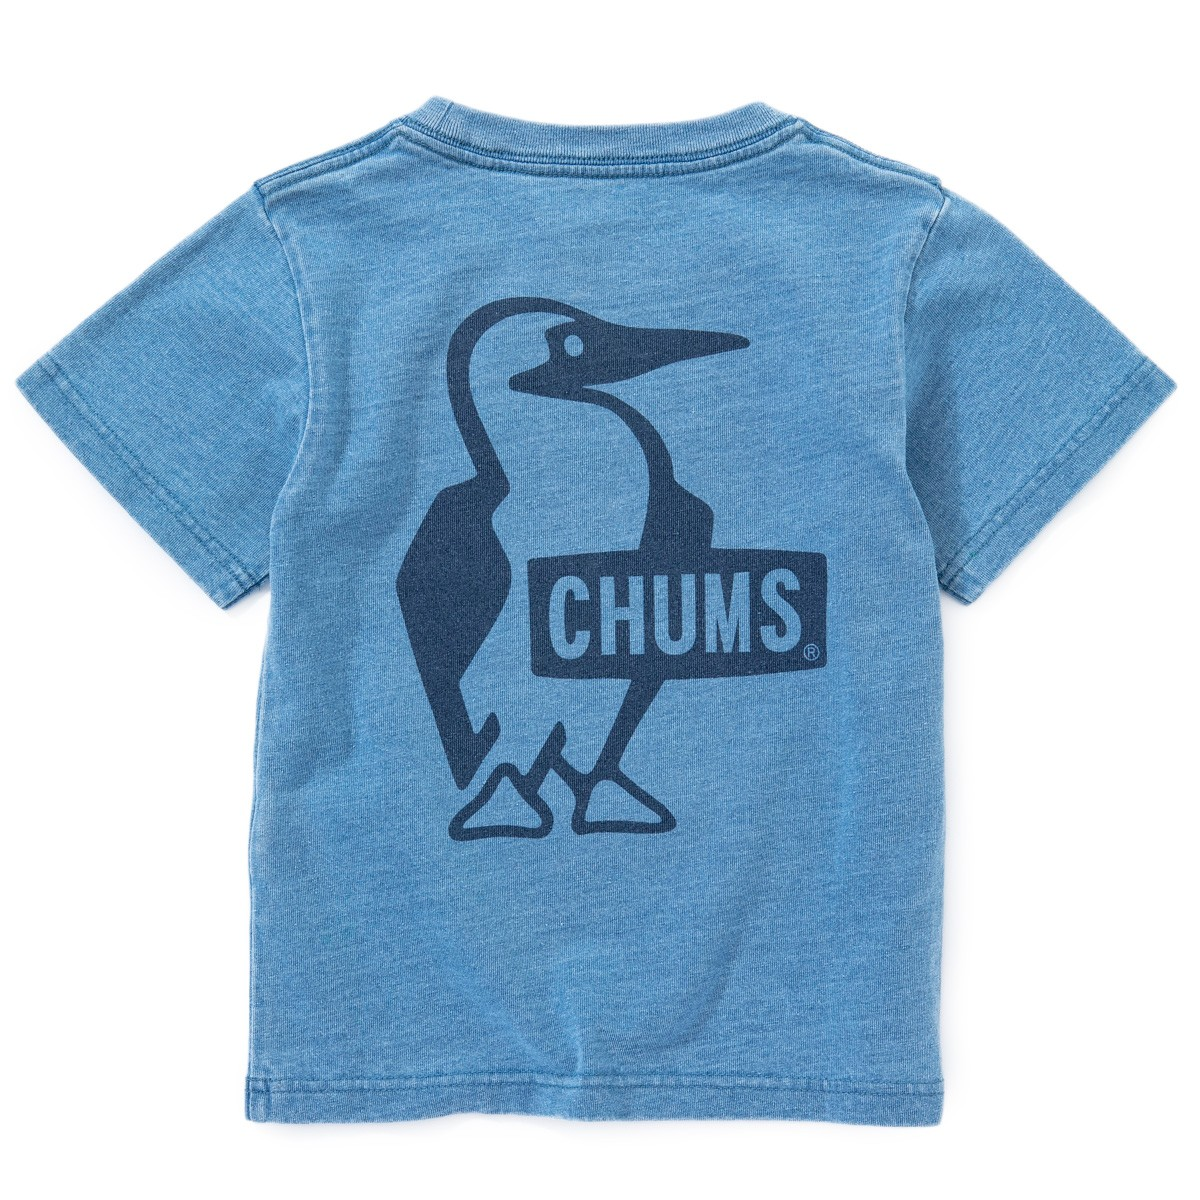 Kid's Booby Logo T-Shirt Indigo チャムス キッズ ブービーロゴ Tシャツ インディゴ